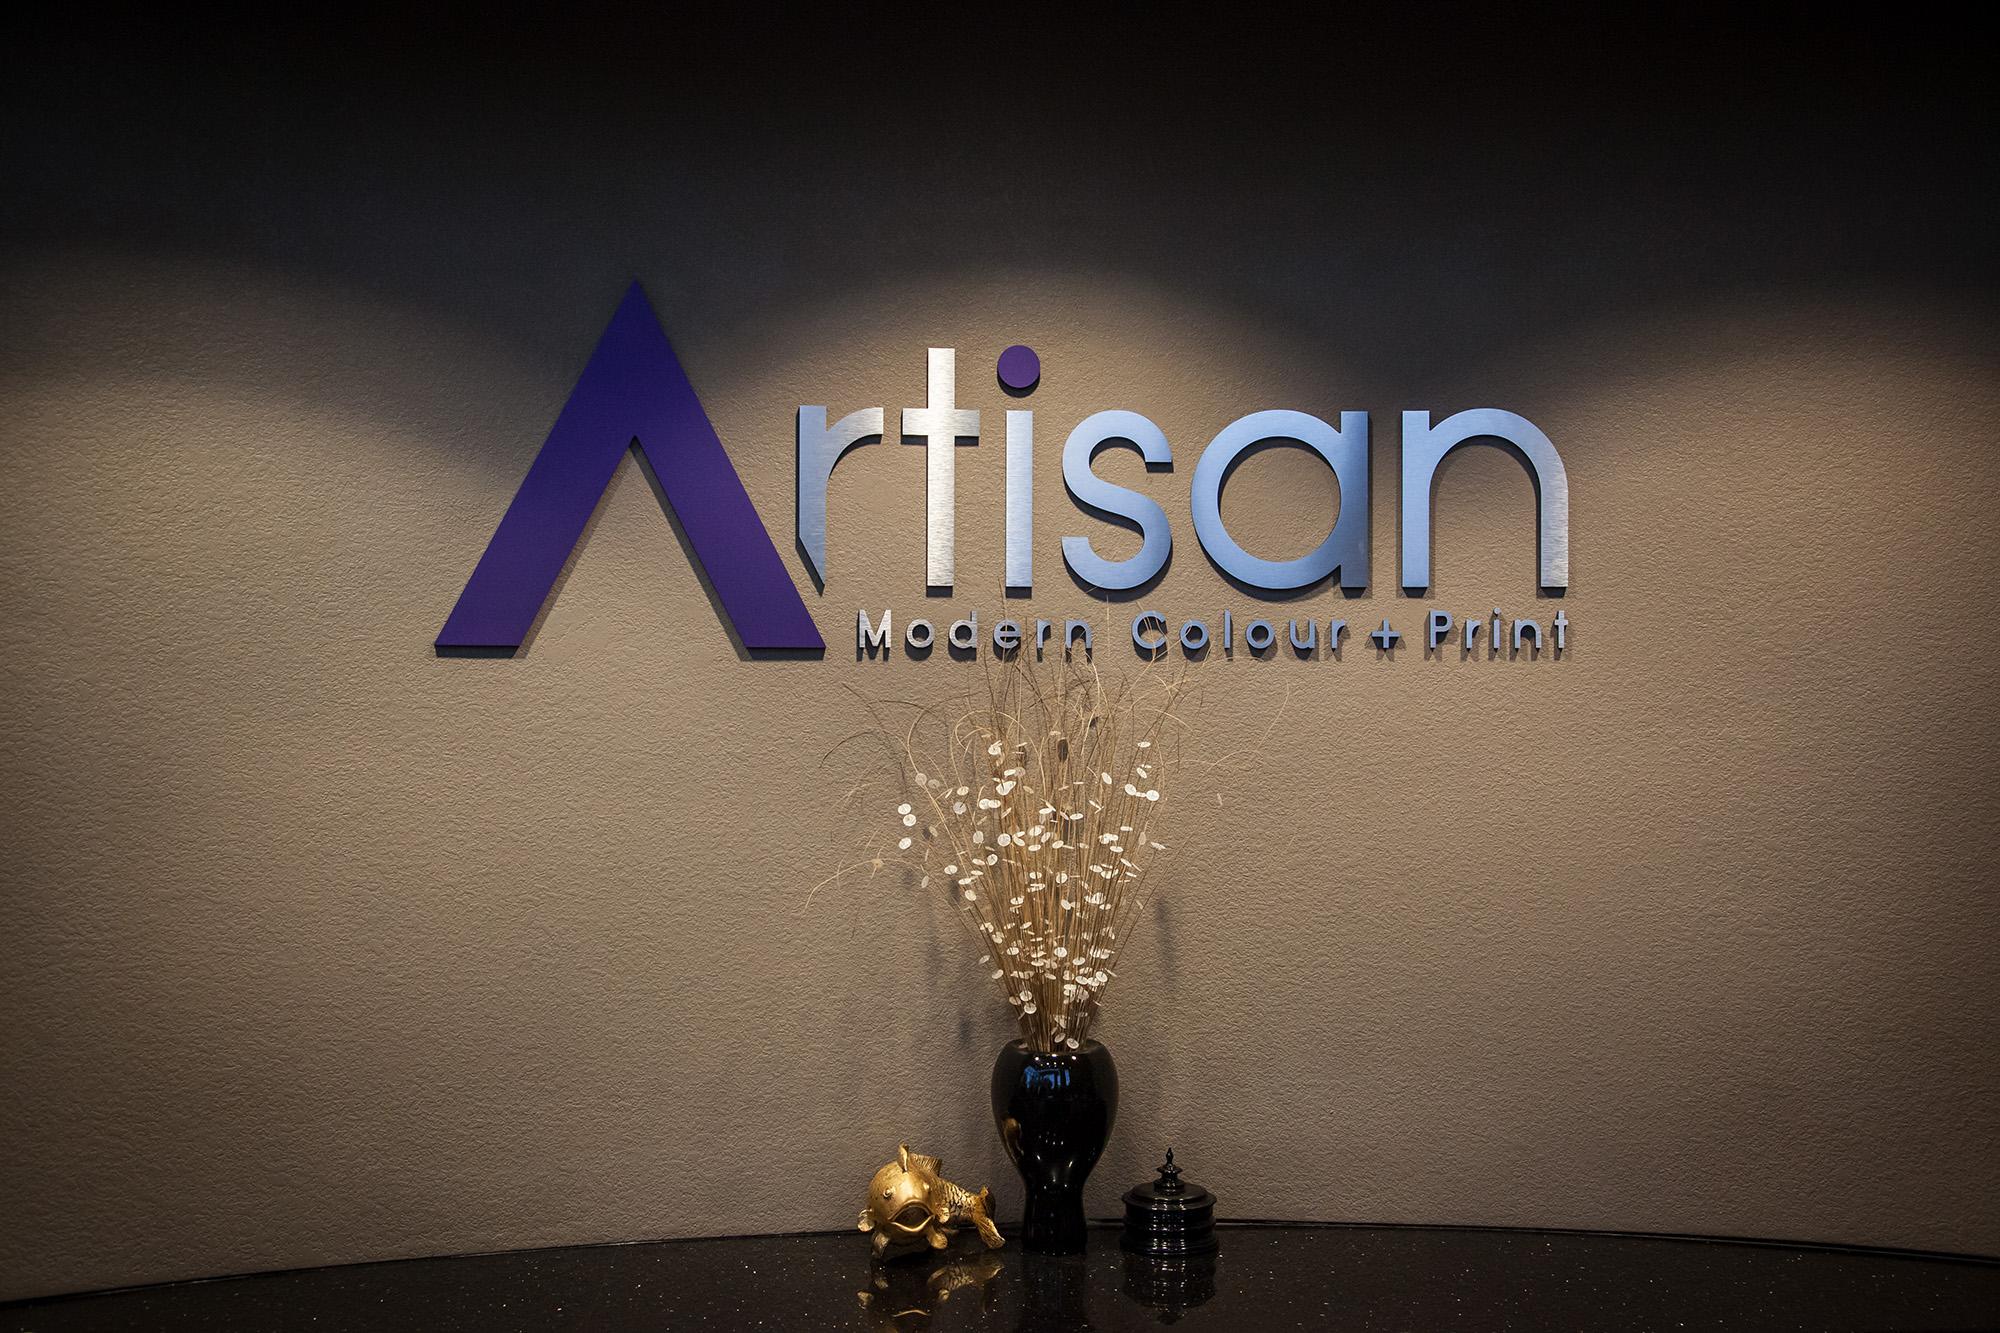 Artisan rebranded lobby